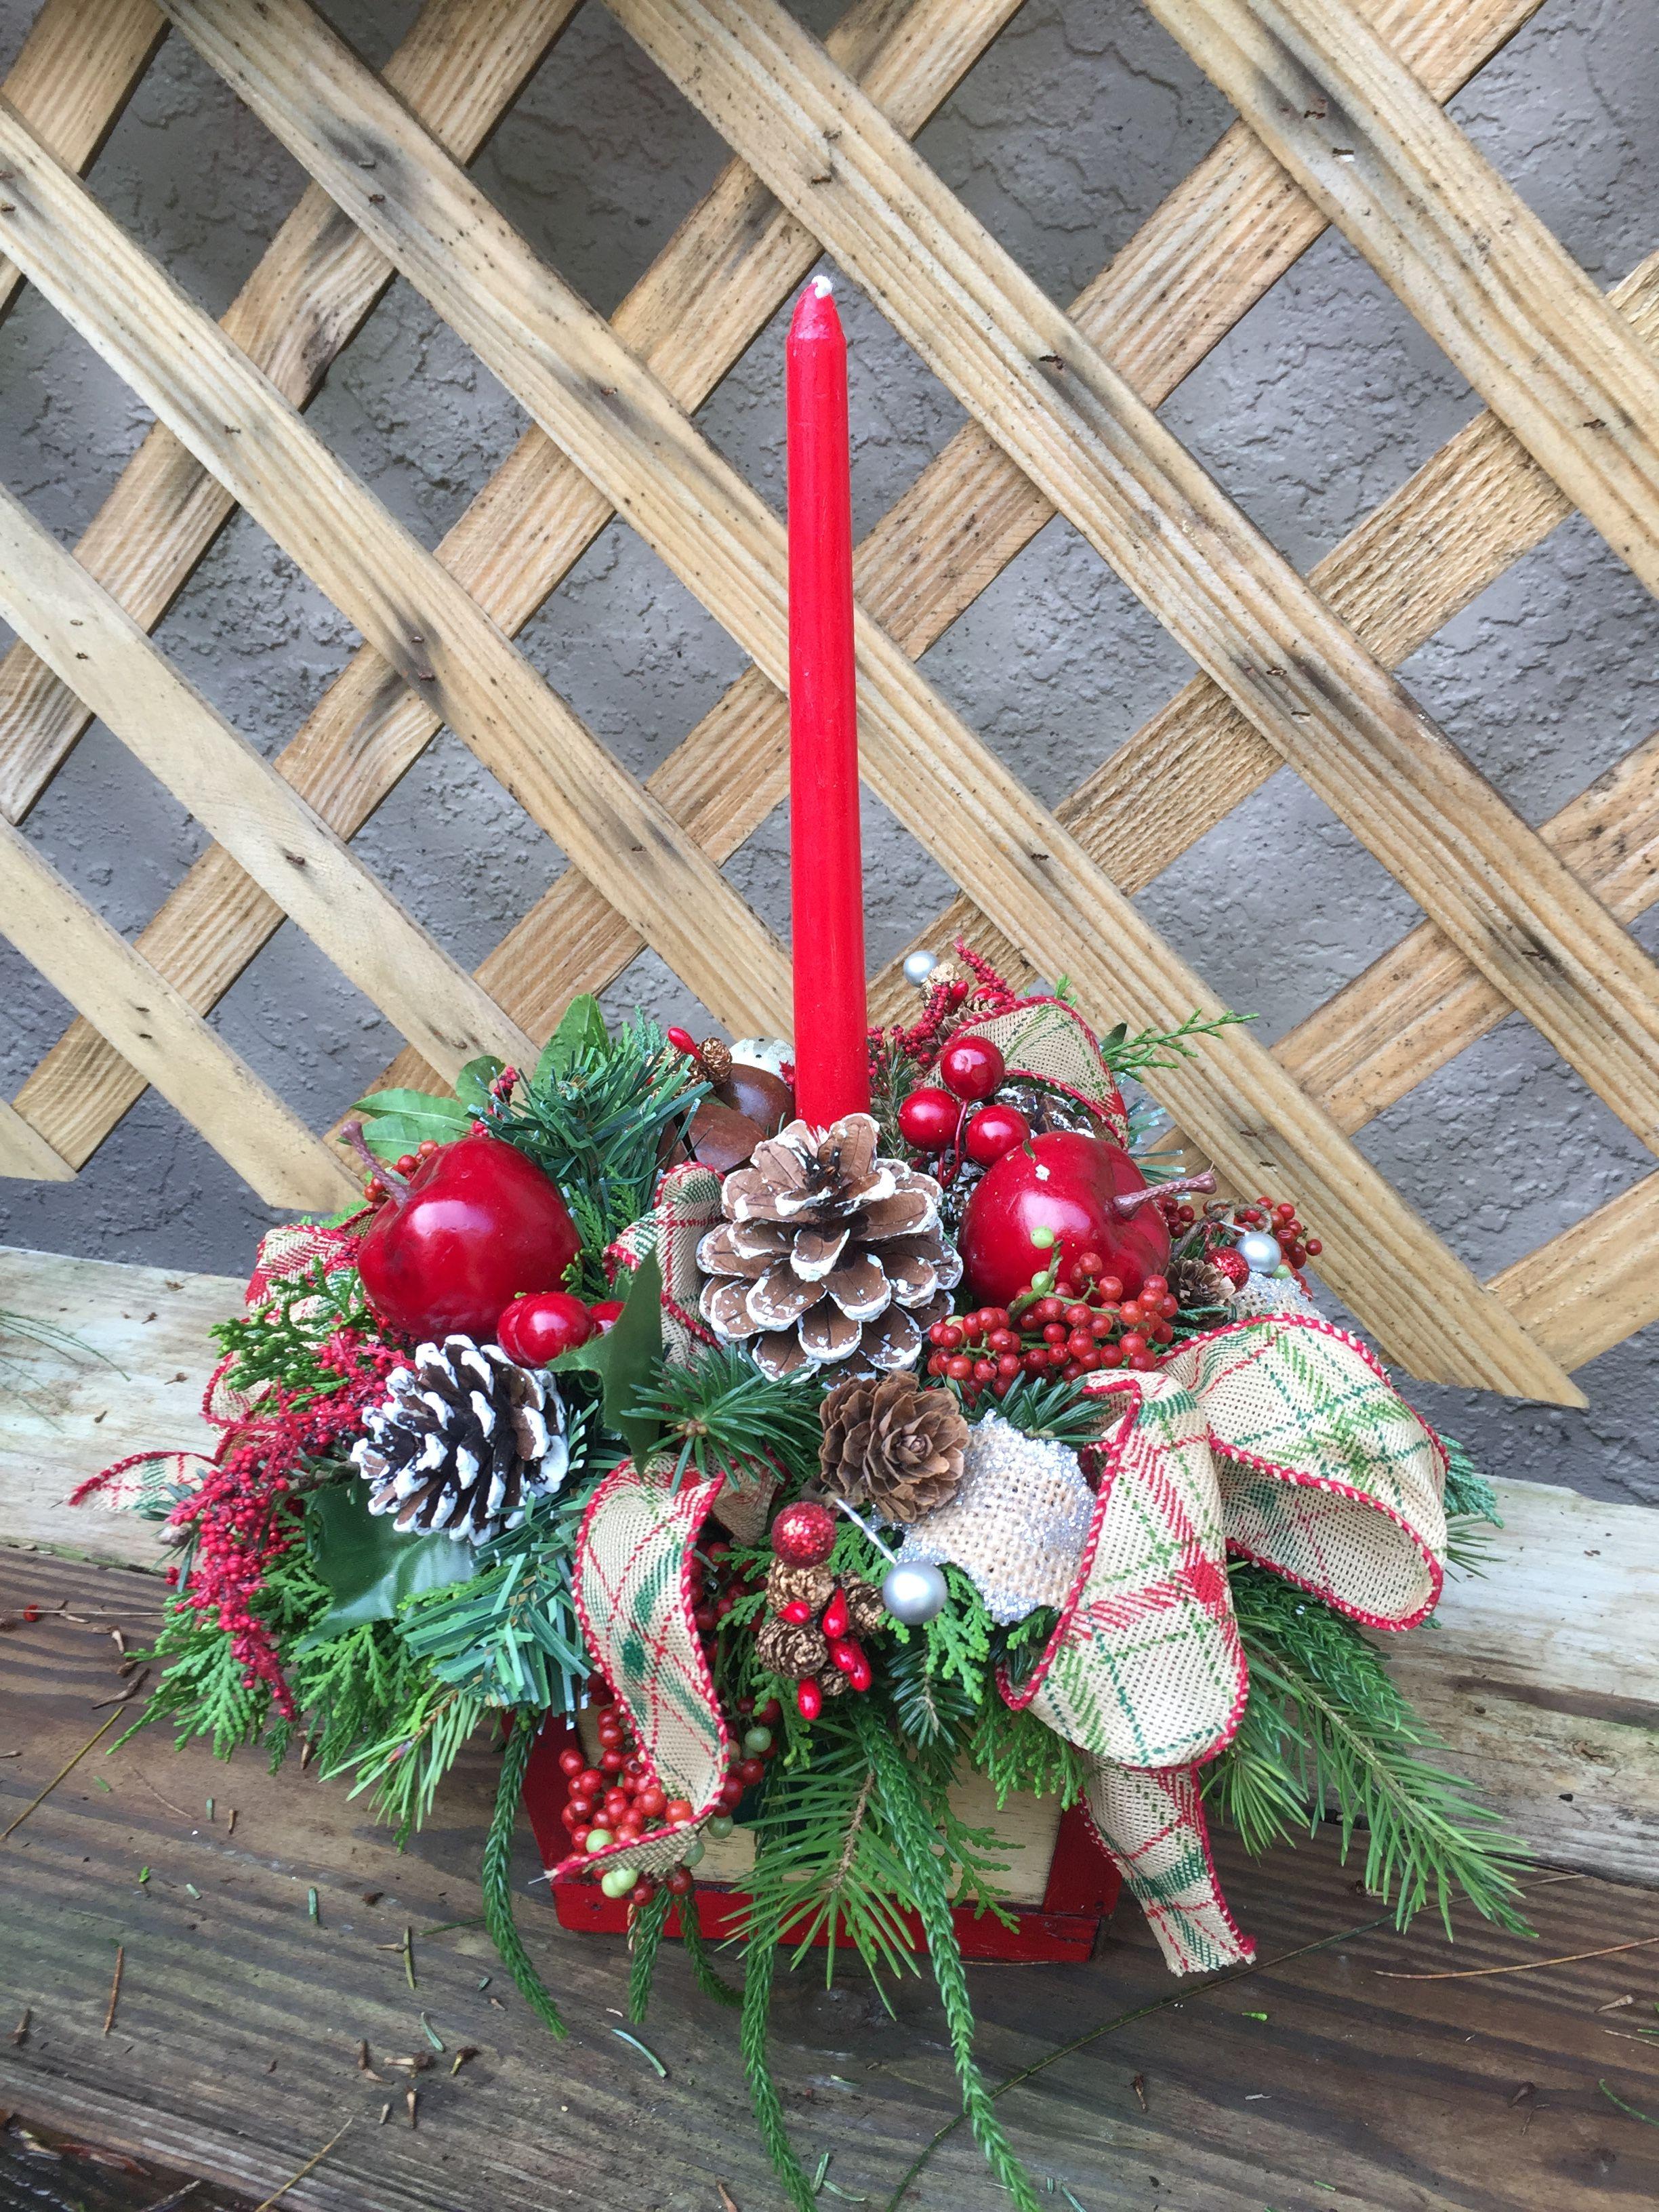 Winter Floral Arrangementschristmas Arrangementssunflower Table Arrangementssilk Arrangementsdecorate Fireplace For Christmaschristmas Tree With Meshoutdoor